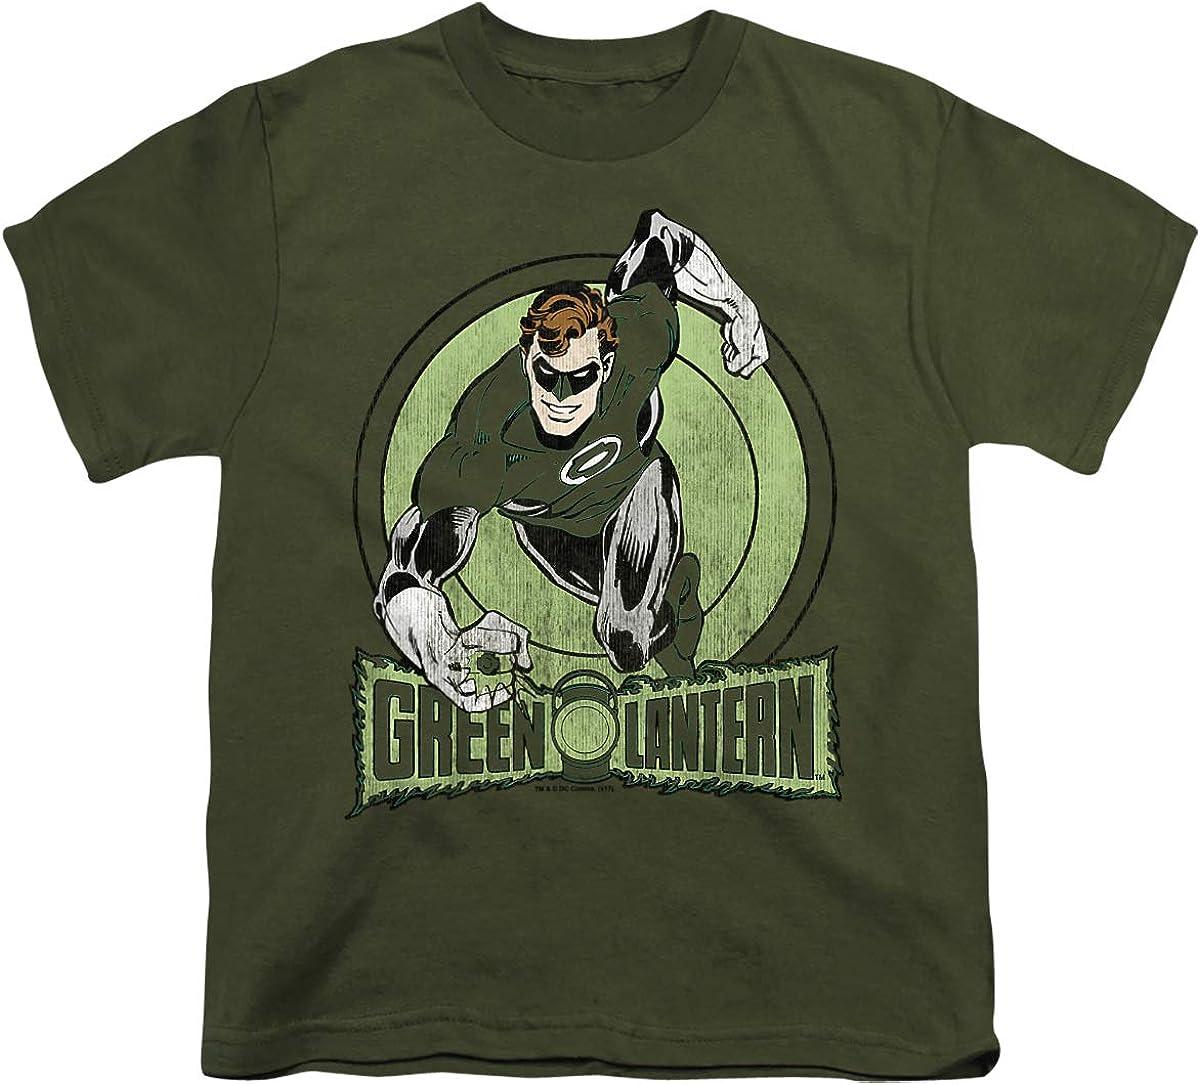 DC Green Lantern Unisex Youth T Shirt, Military Green, Medium